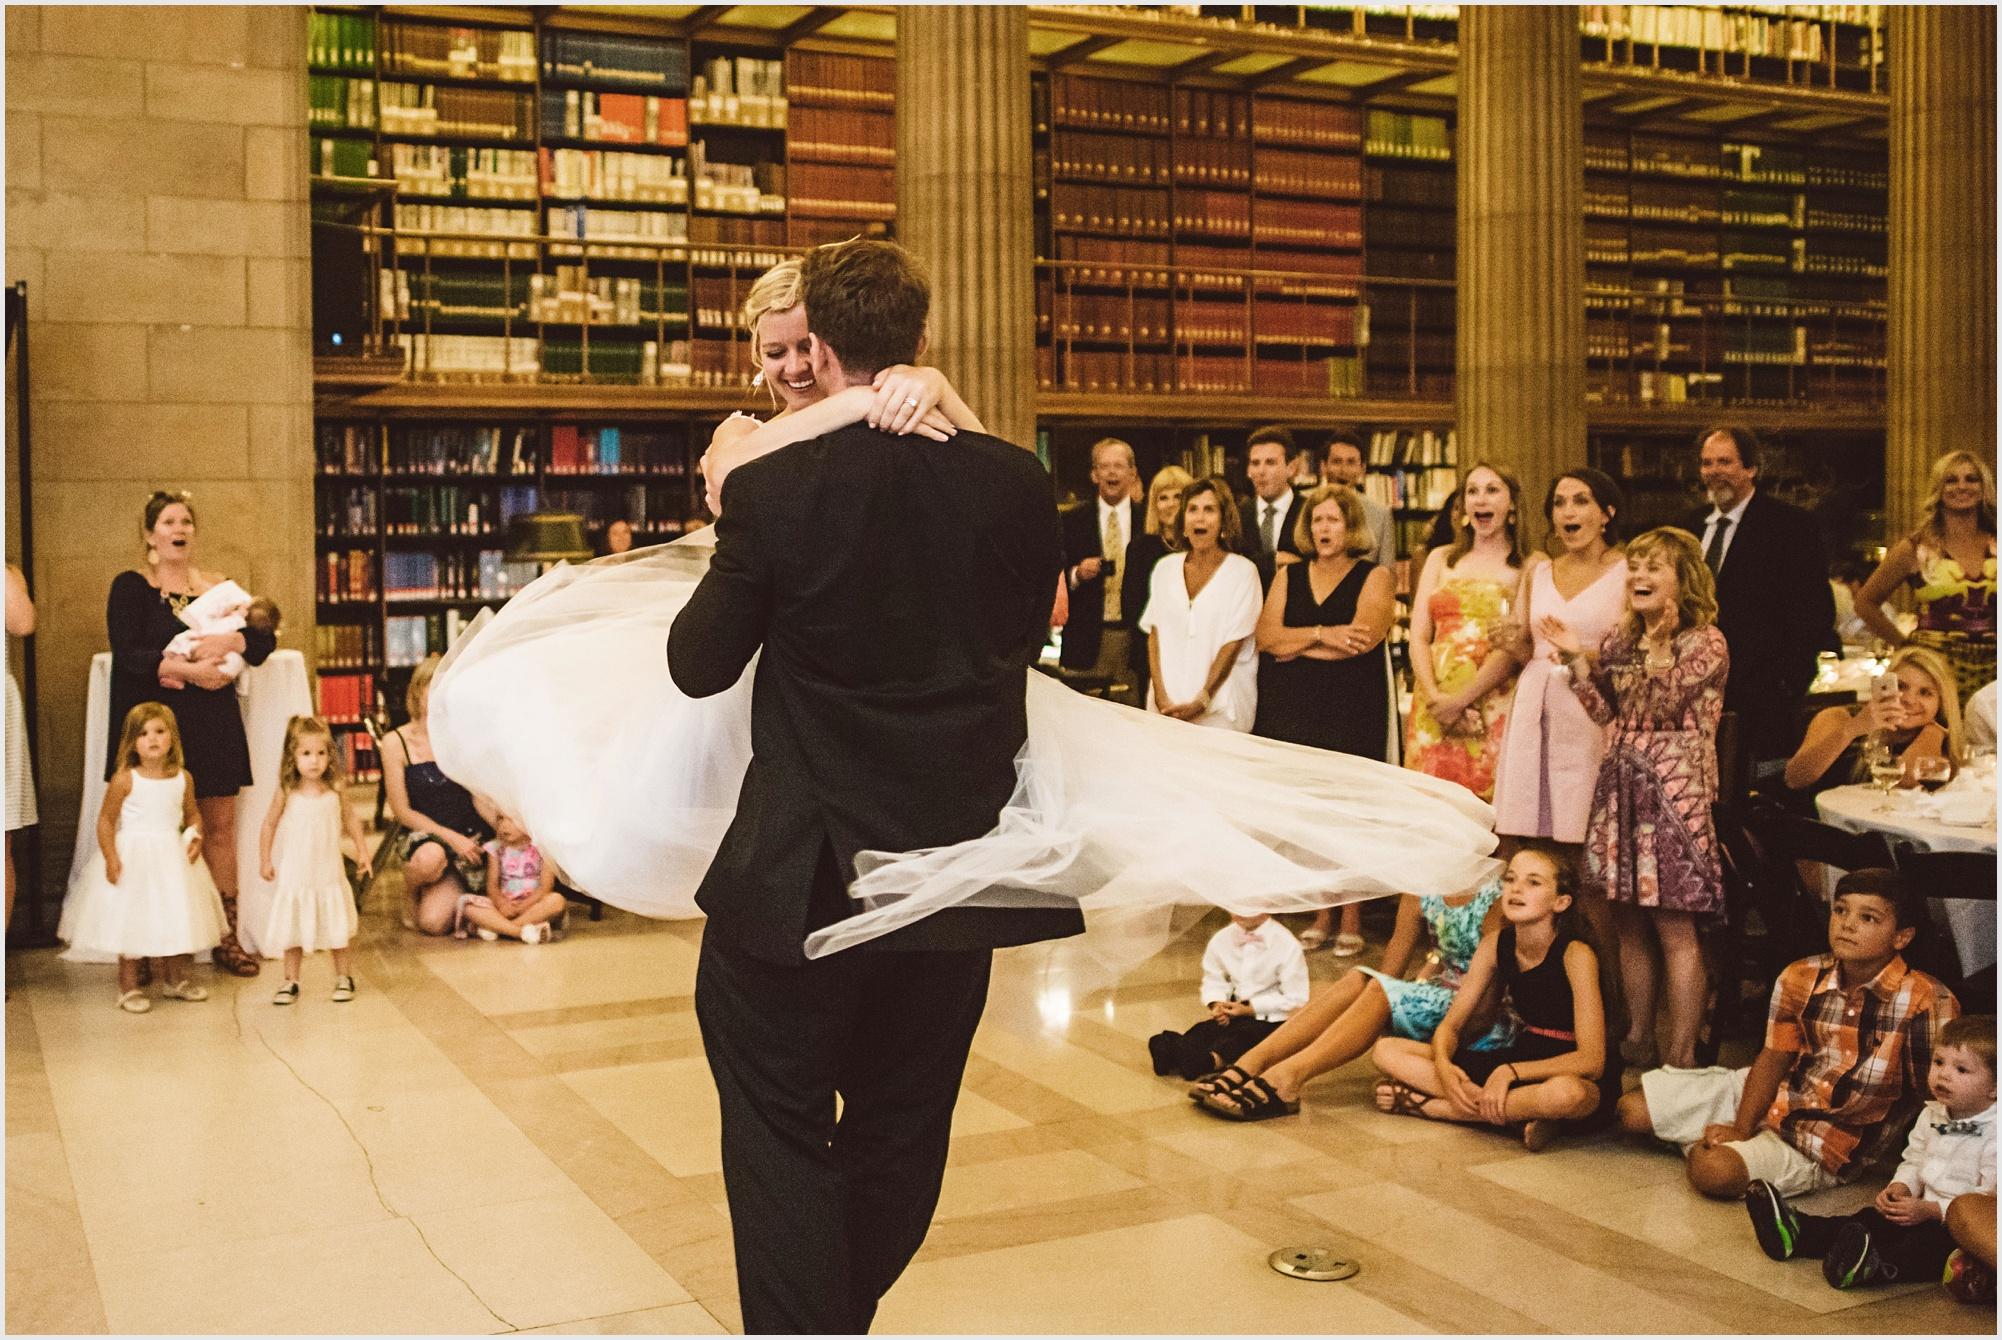 maura_david_james_j_hill_wedding_lucas_botz_photography_055.jpg